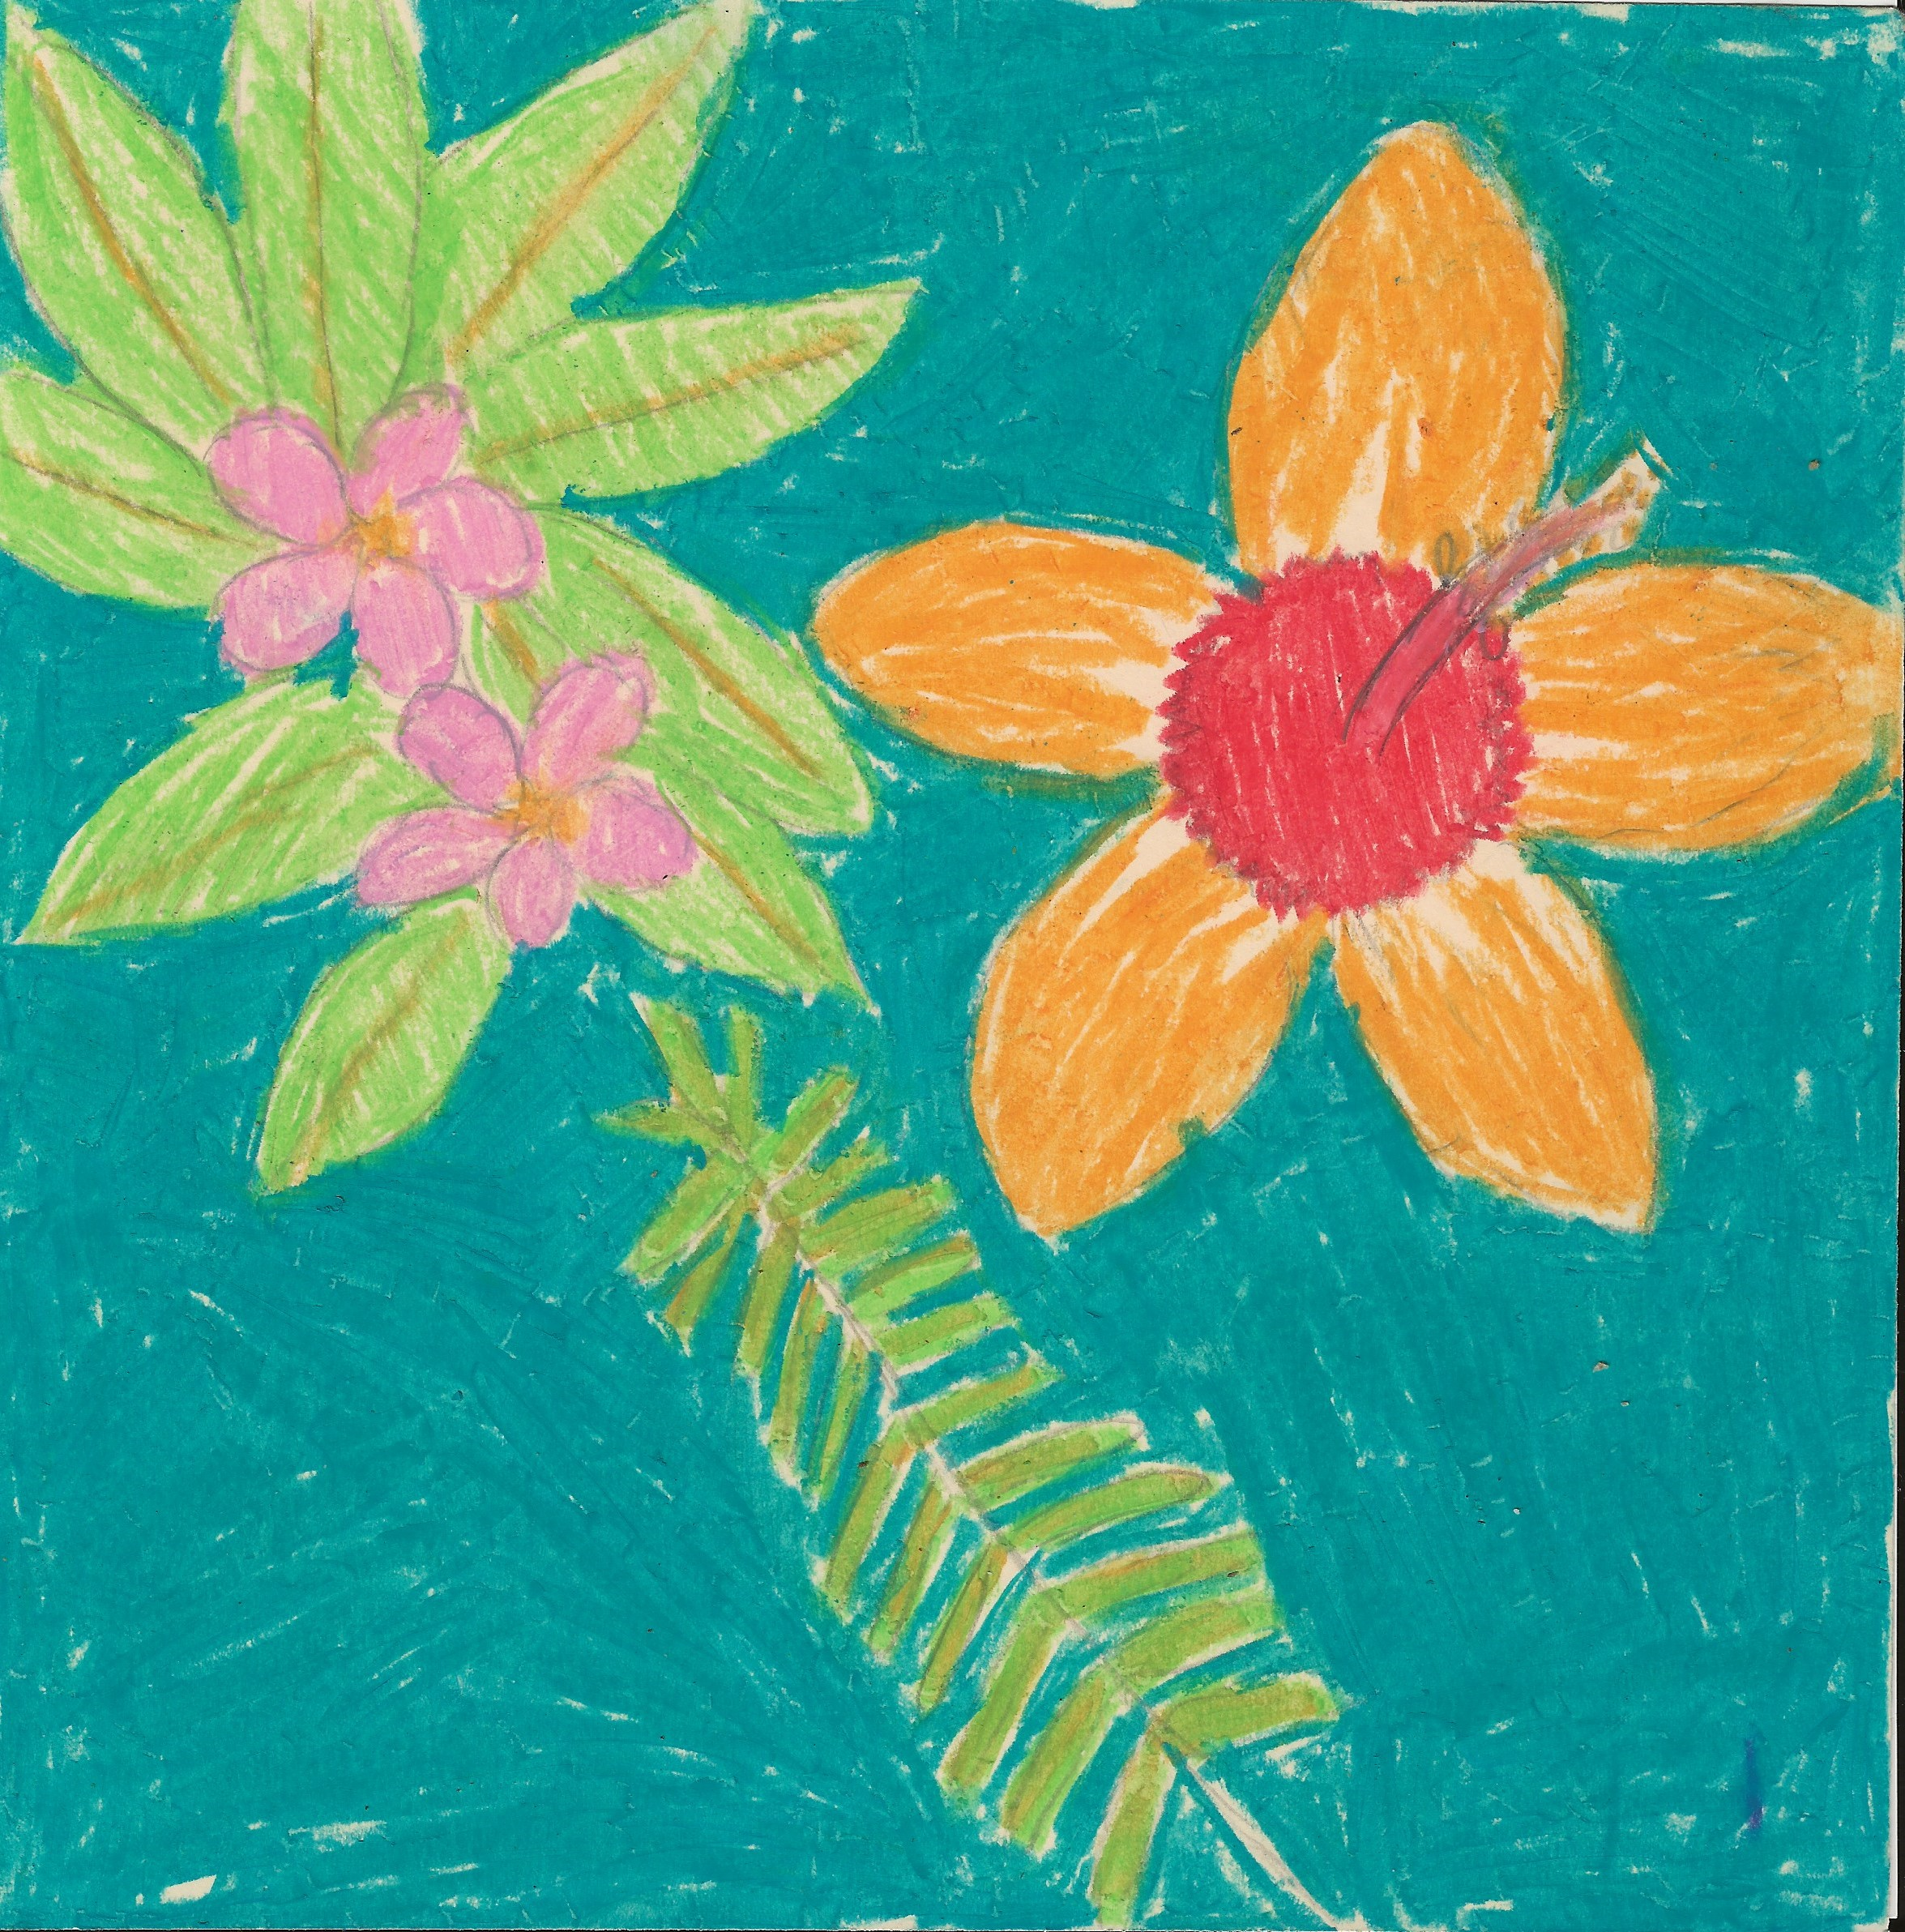 "<br><br>""Hawaiian Flowers"" by Autumn E, - 2-D Visual Arts (Intermediate - Grades 3-5)"